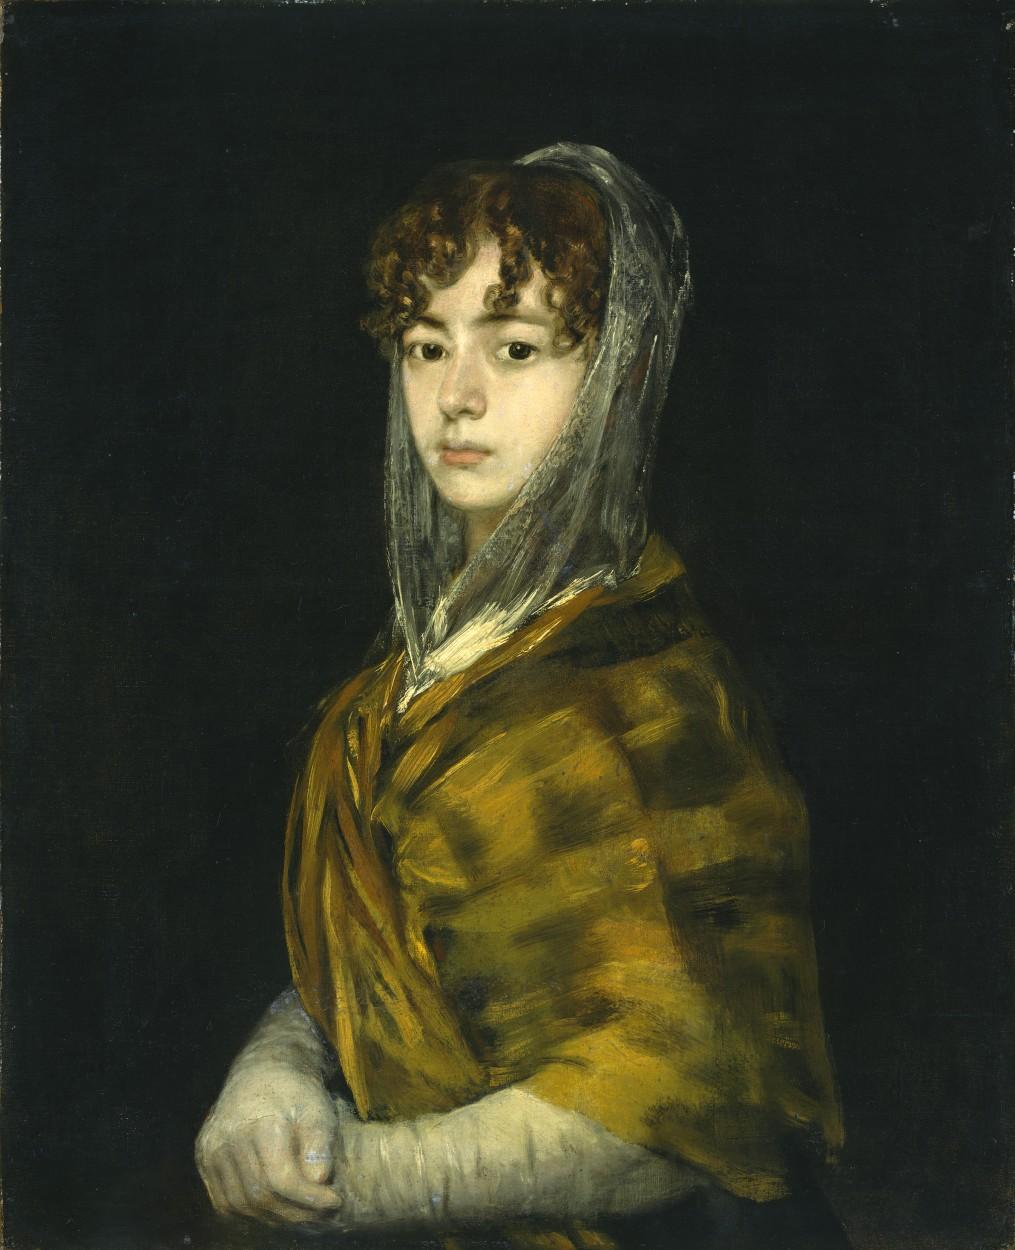 Señora Sabasa Garcia by Francisco Goya via DailyArt app, your daily dose of art getdailyart.com